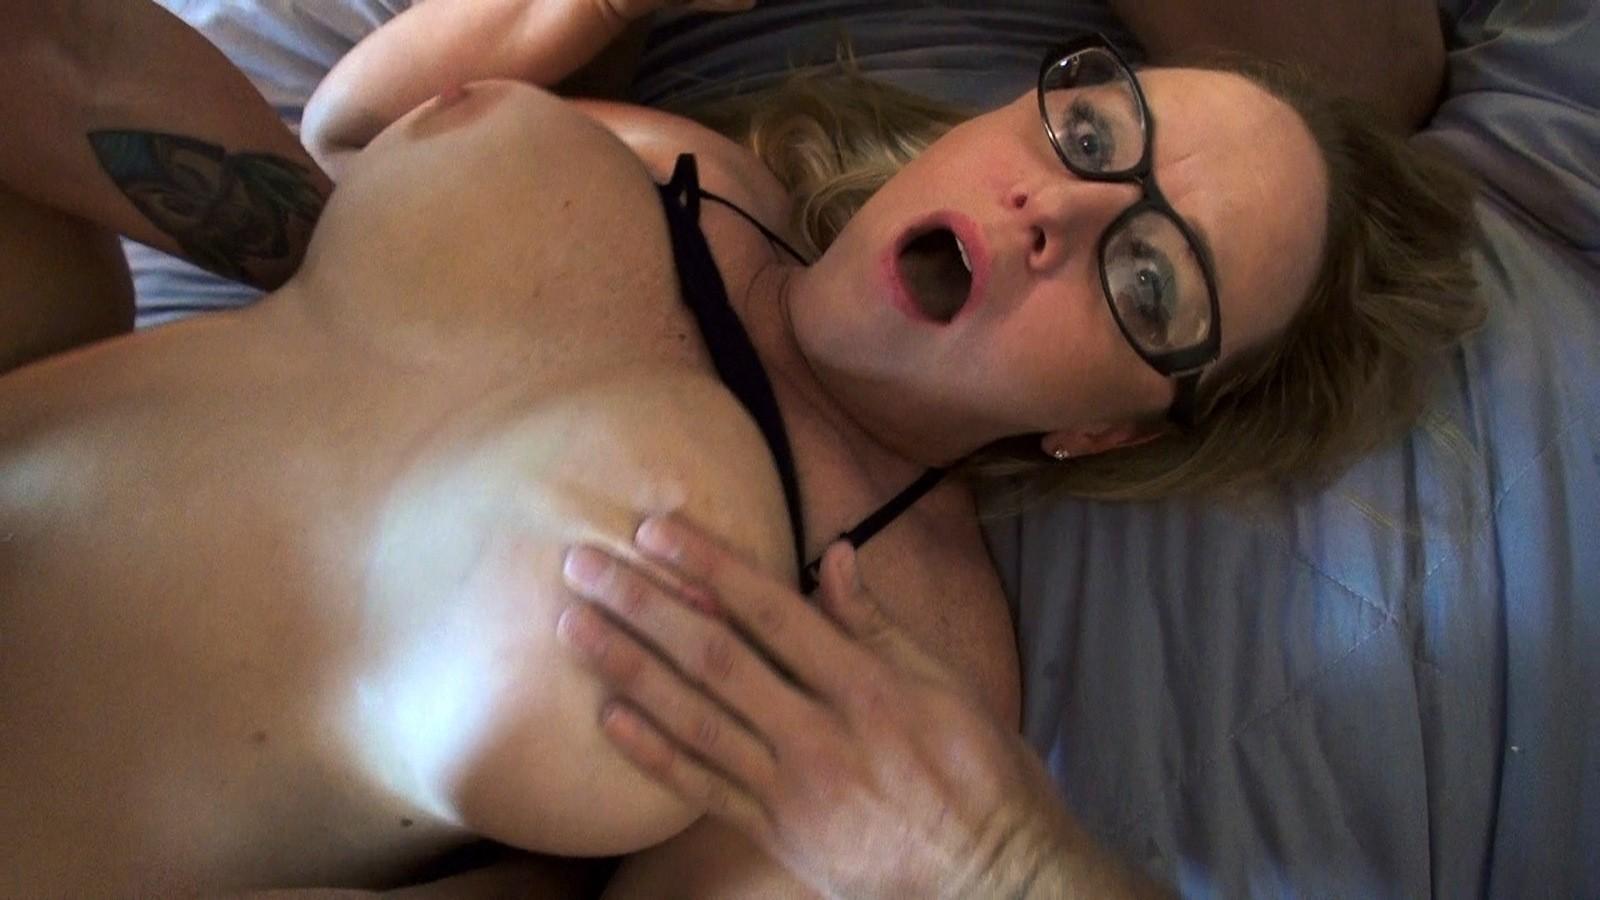 Busty british sluts have insane orgasms 6